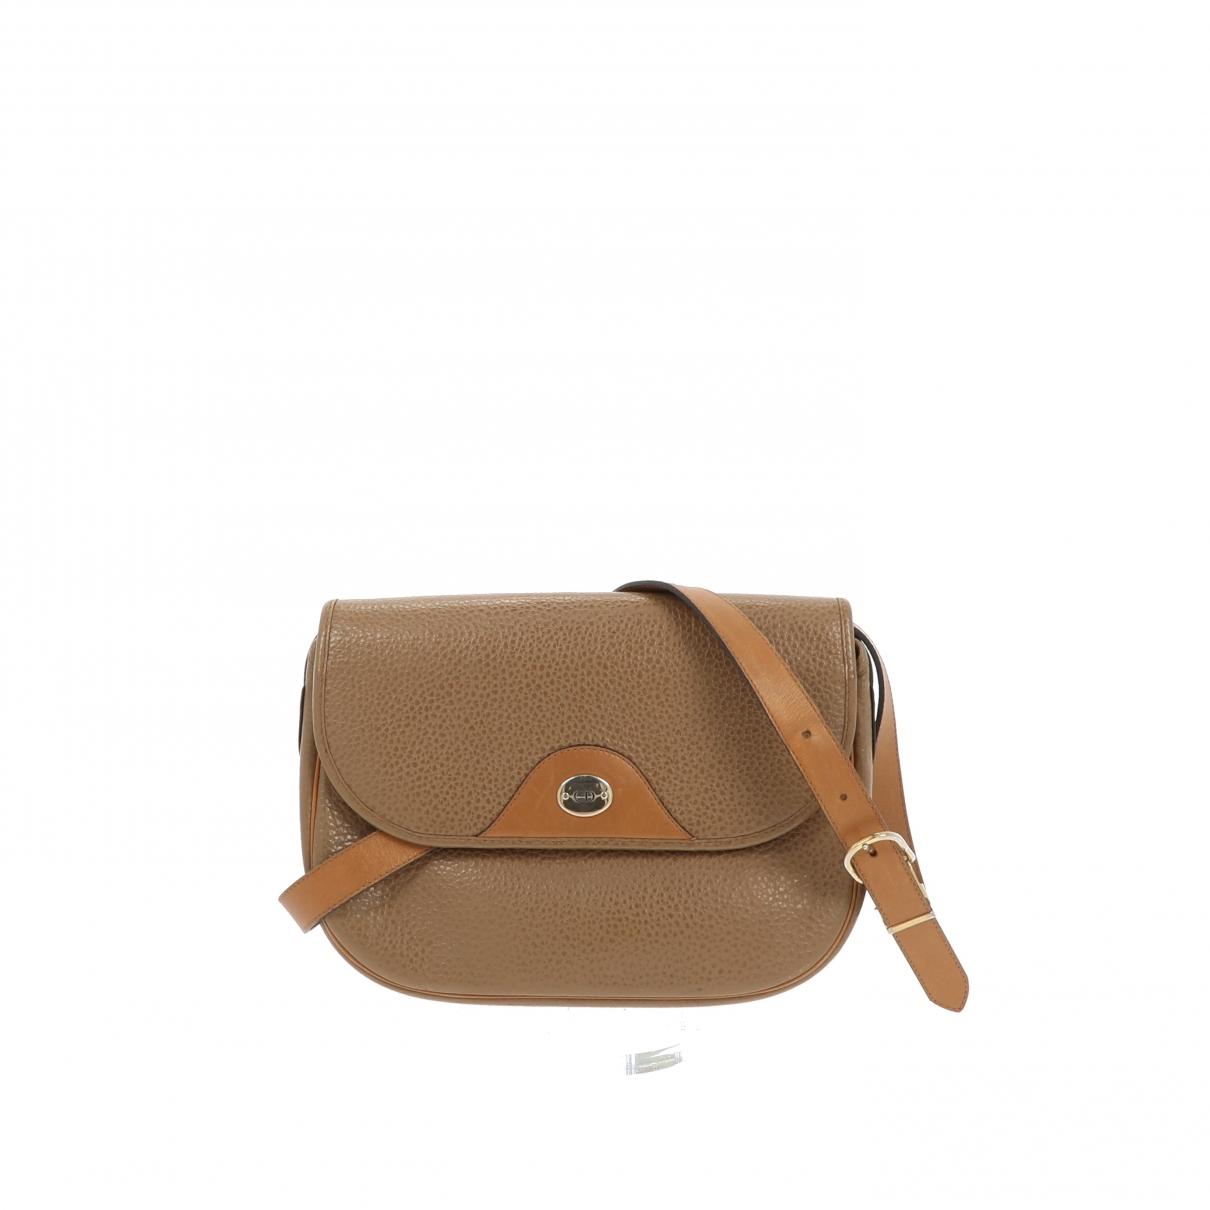 Christian Dior \N Brown Leather handbag for Women \N